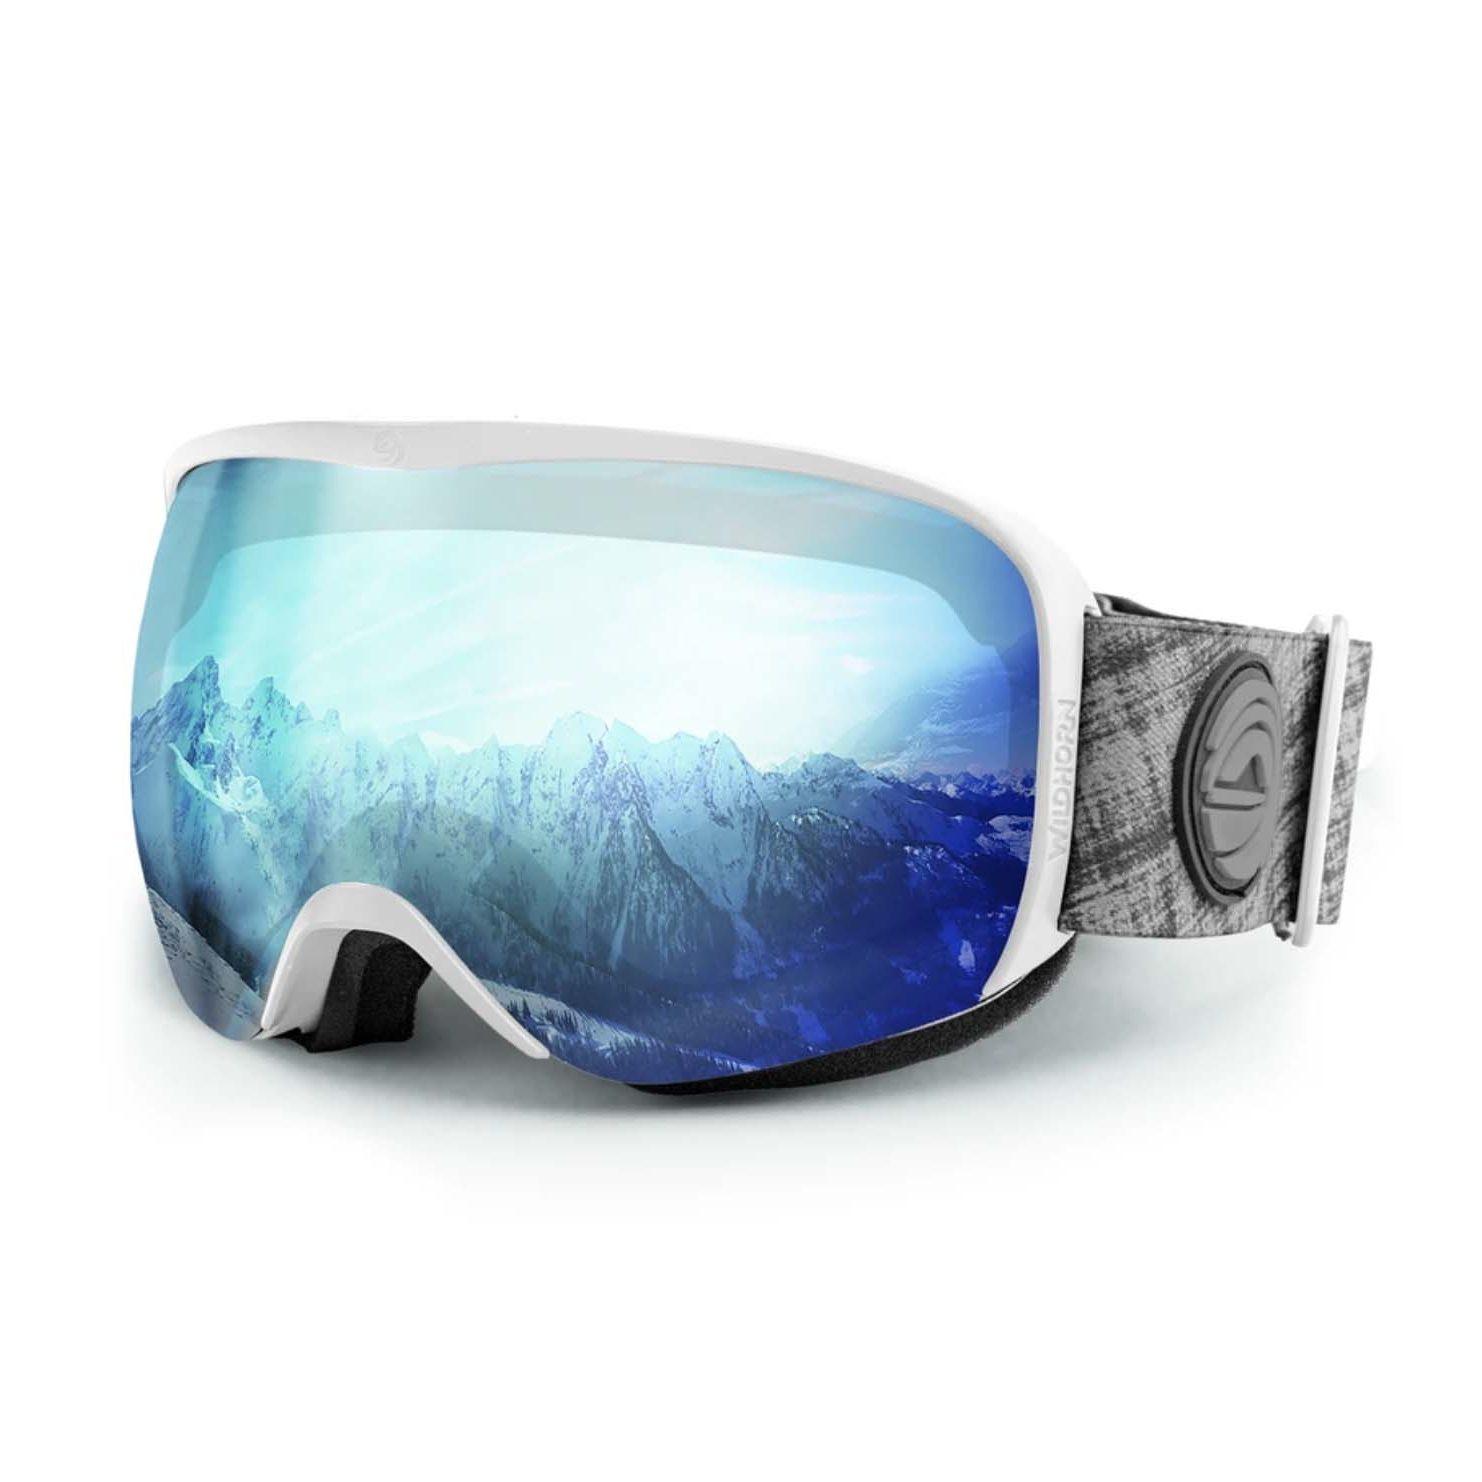 Types of Eyewear - Snow Goggles